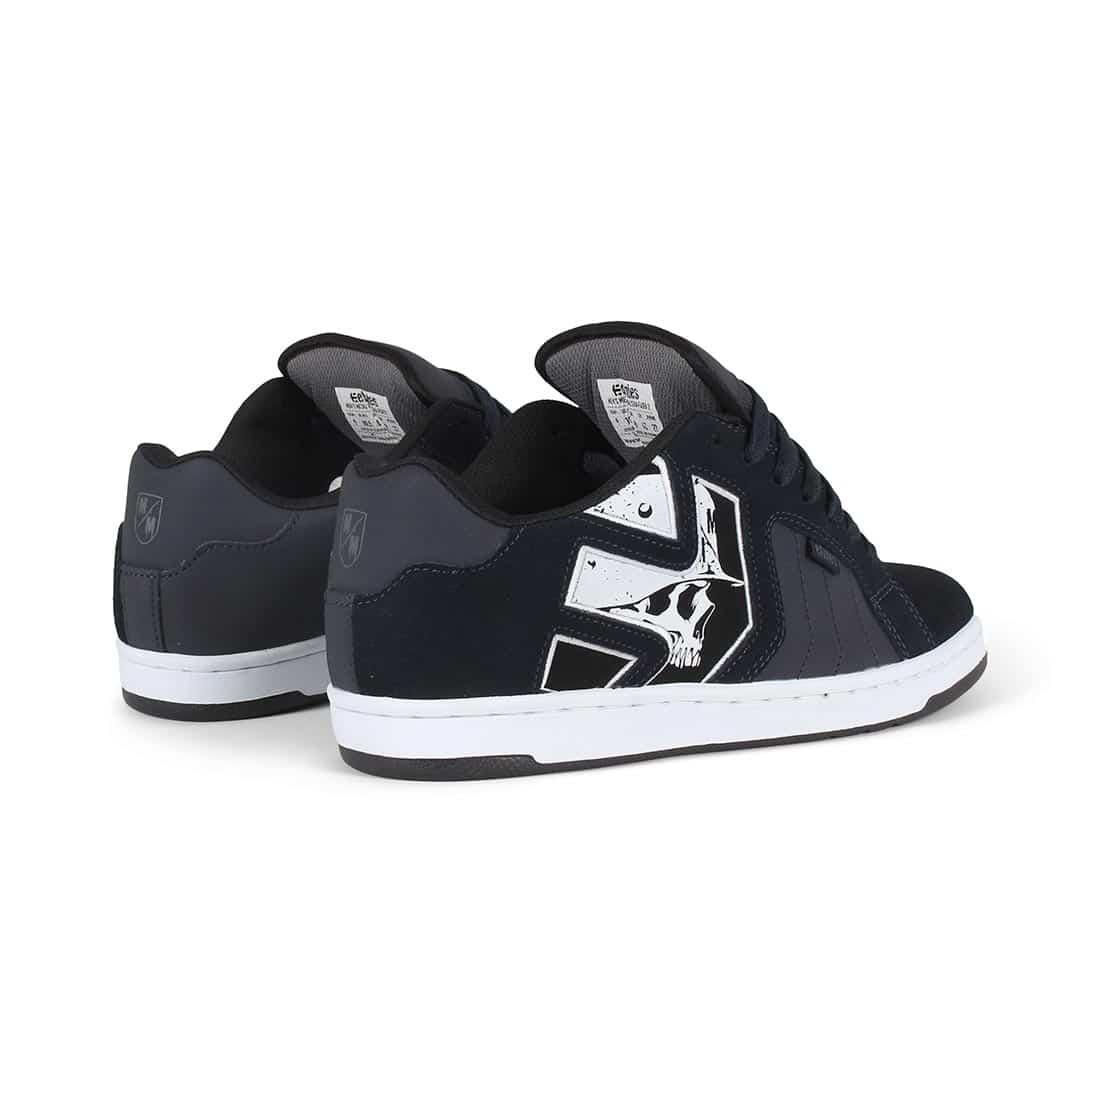 bfb57d1f6f4 ... Etnies-Metal-Mulisha-Fader-2-Shoes-Navy- ...